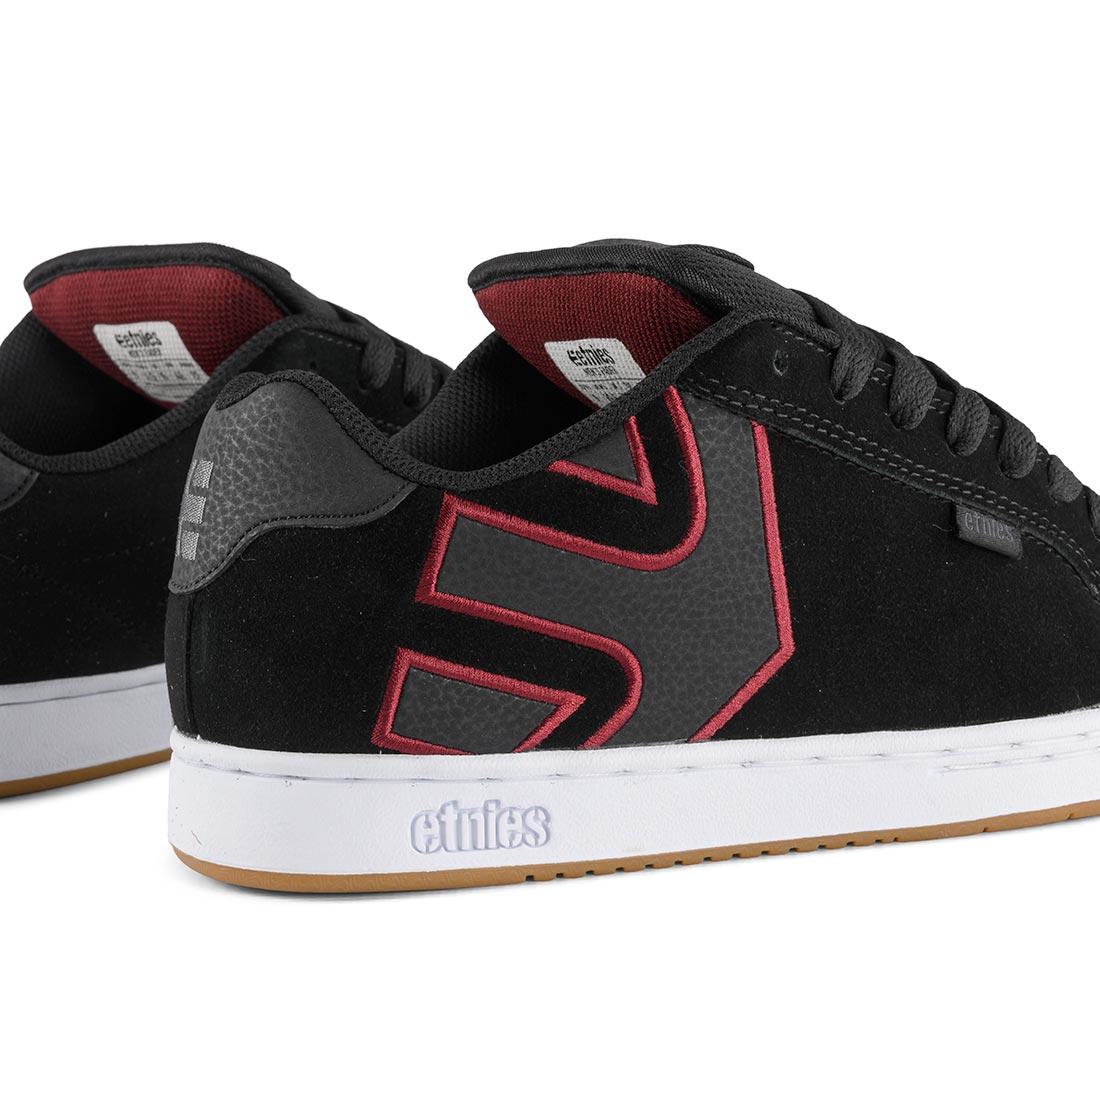 Etnies Fader Shoes – Black / White / Burgundy